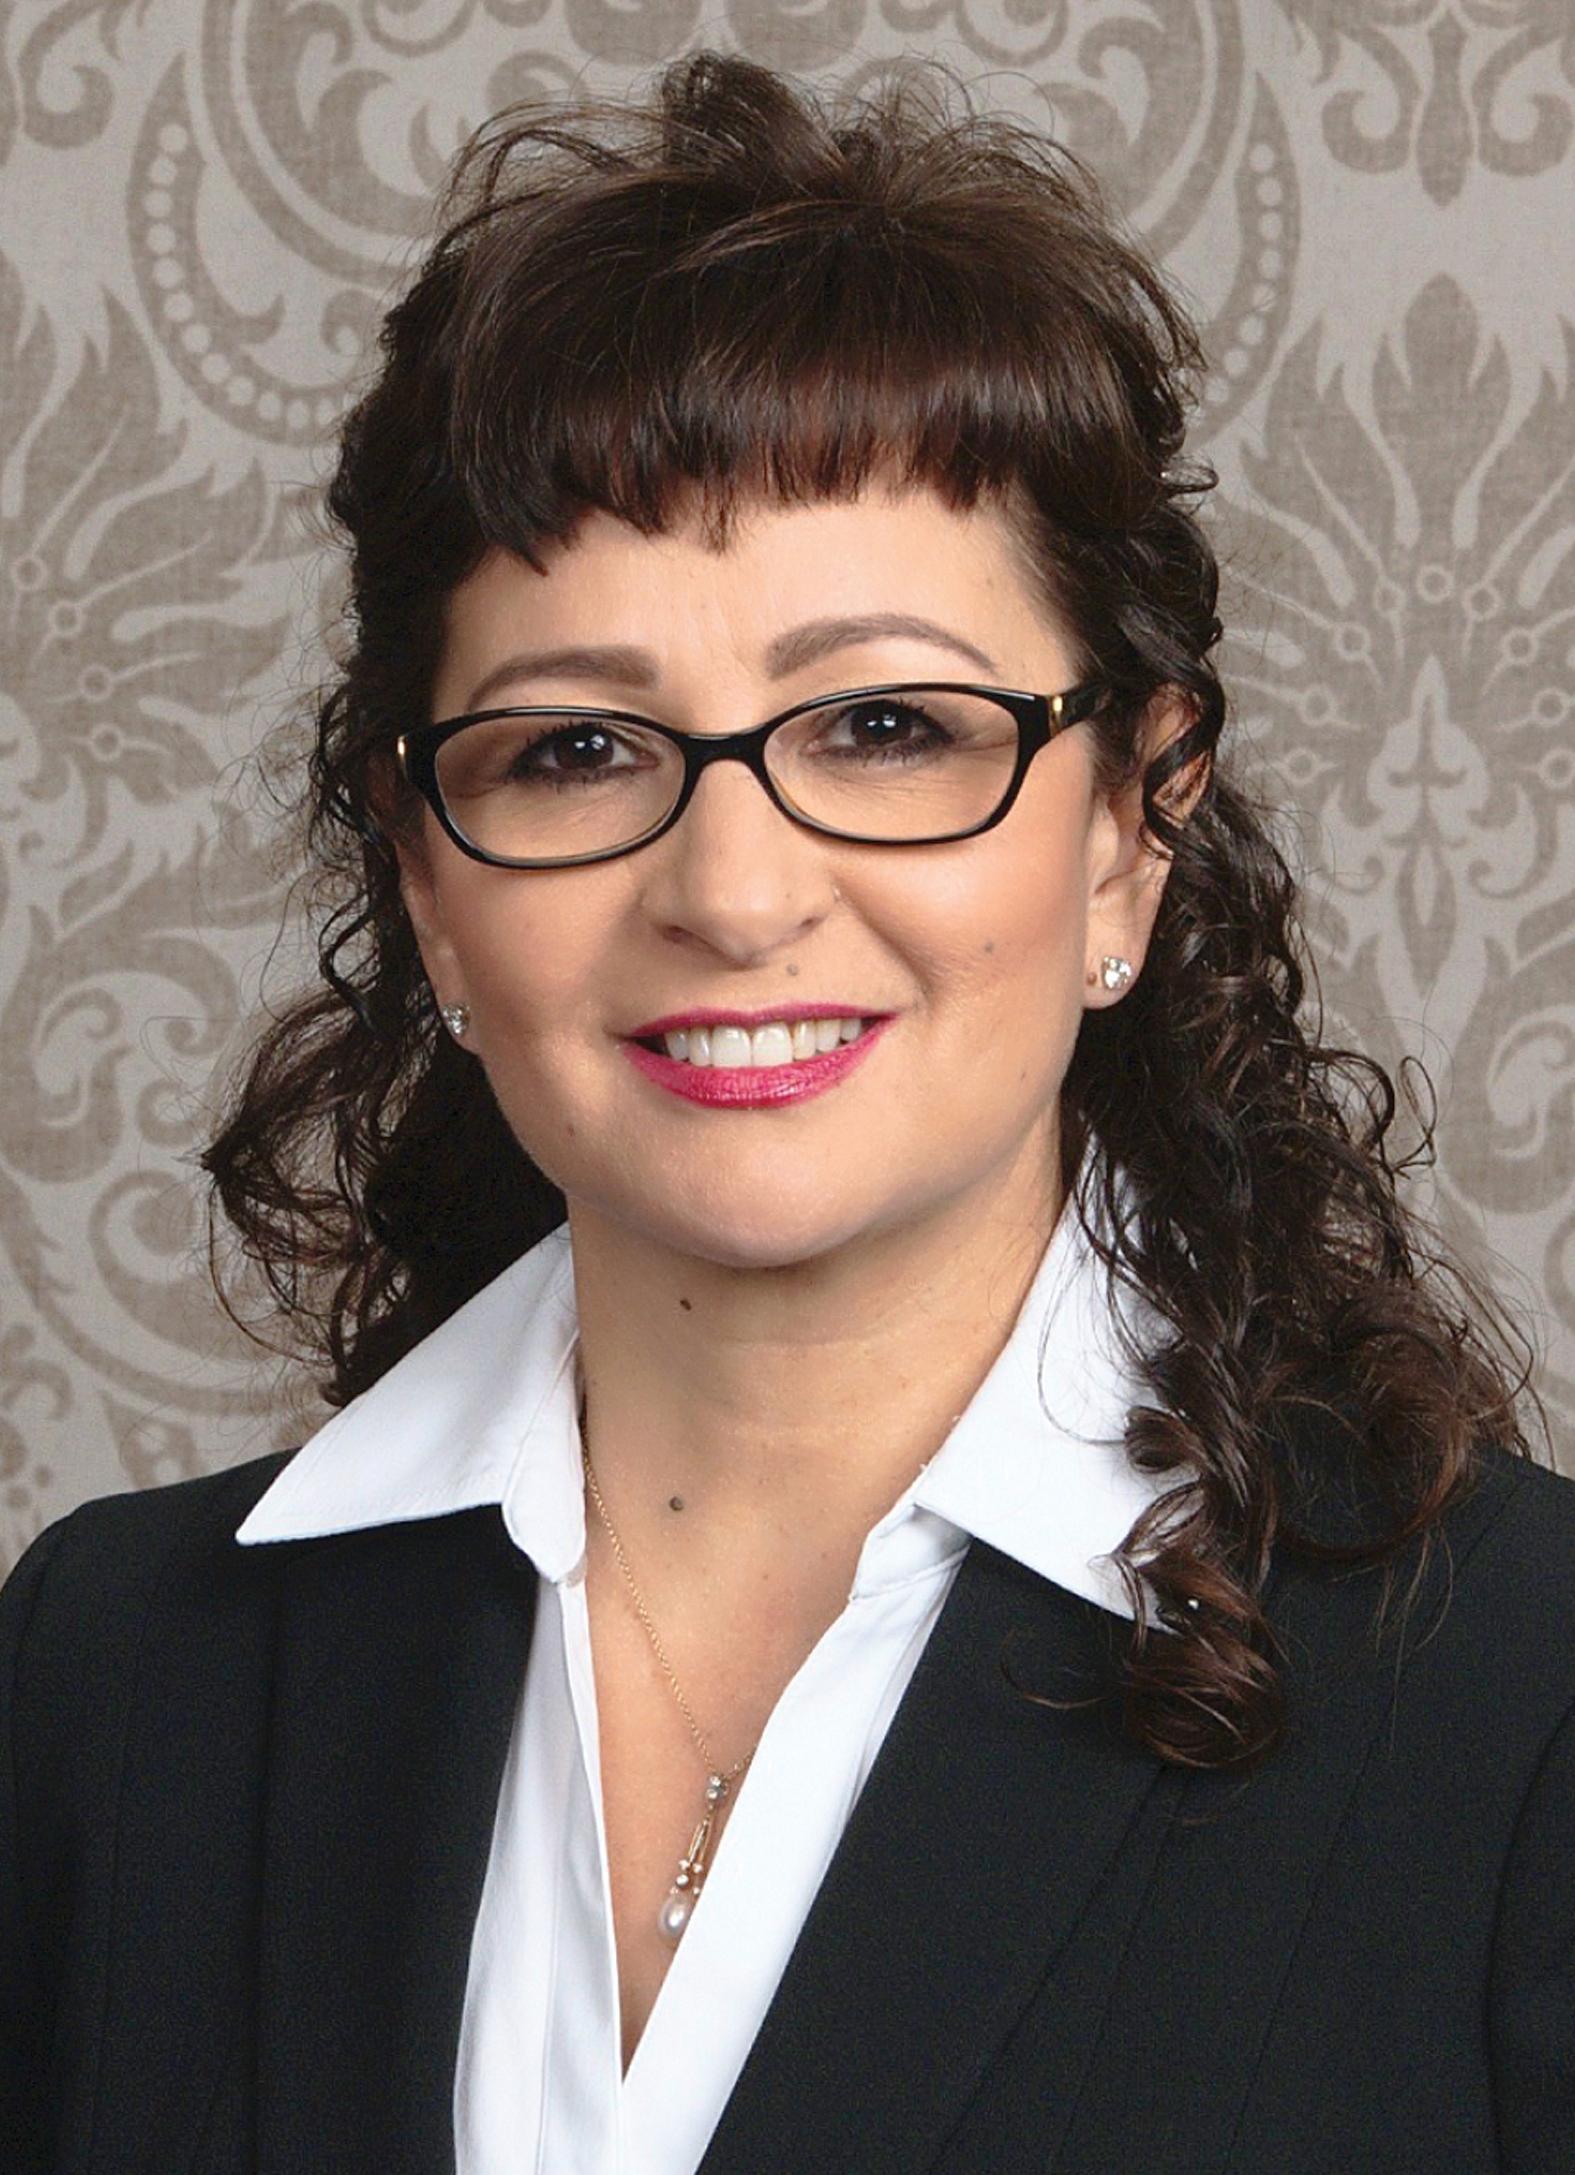 Maribel Brown - Rancho Cucamonga Chamber of Commerce - Chairman